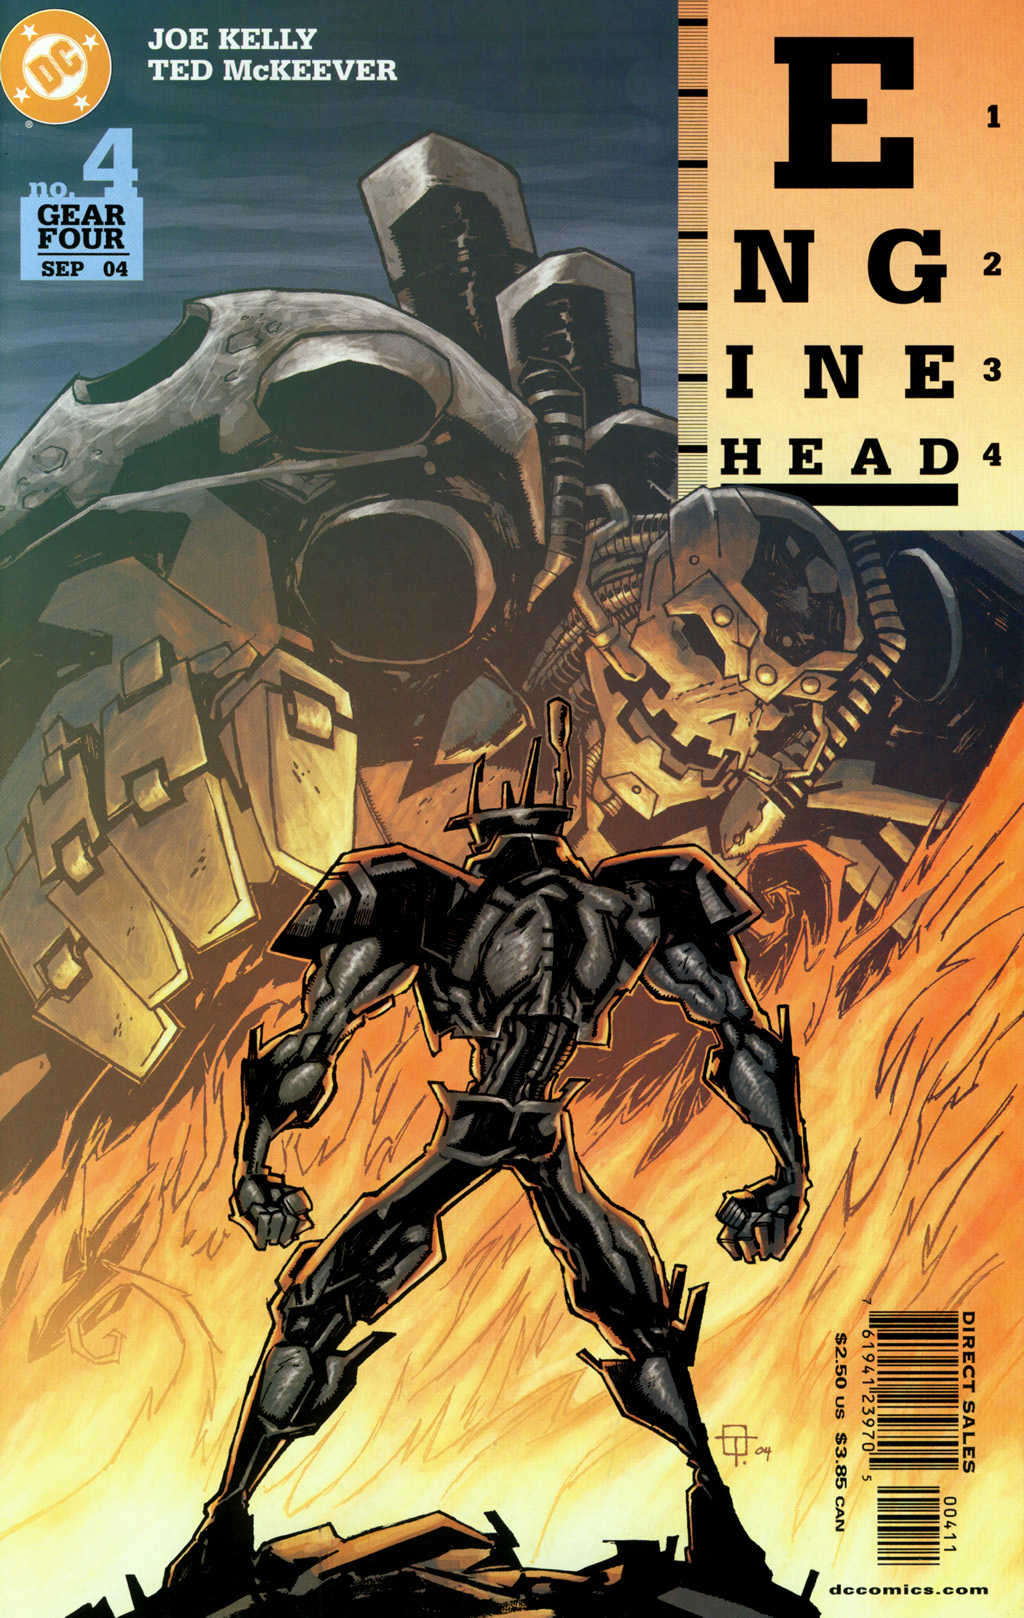 Read online Enginehead comic -  Issue #4 - 1